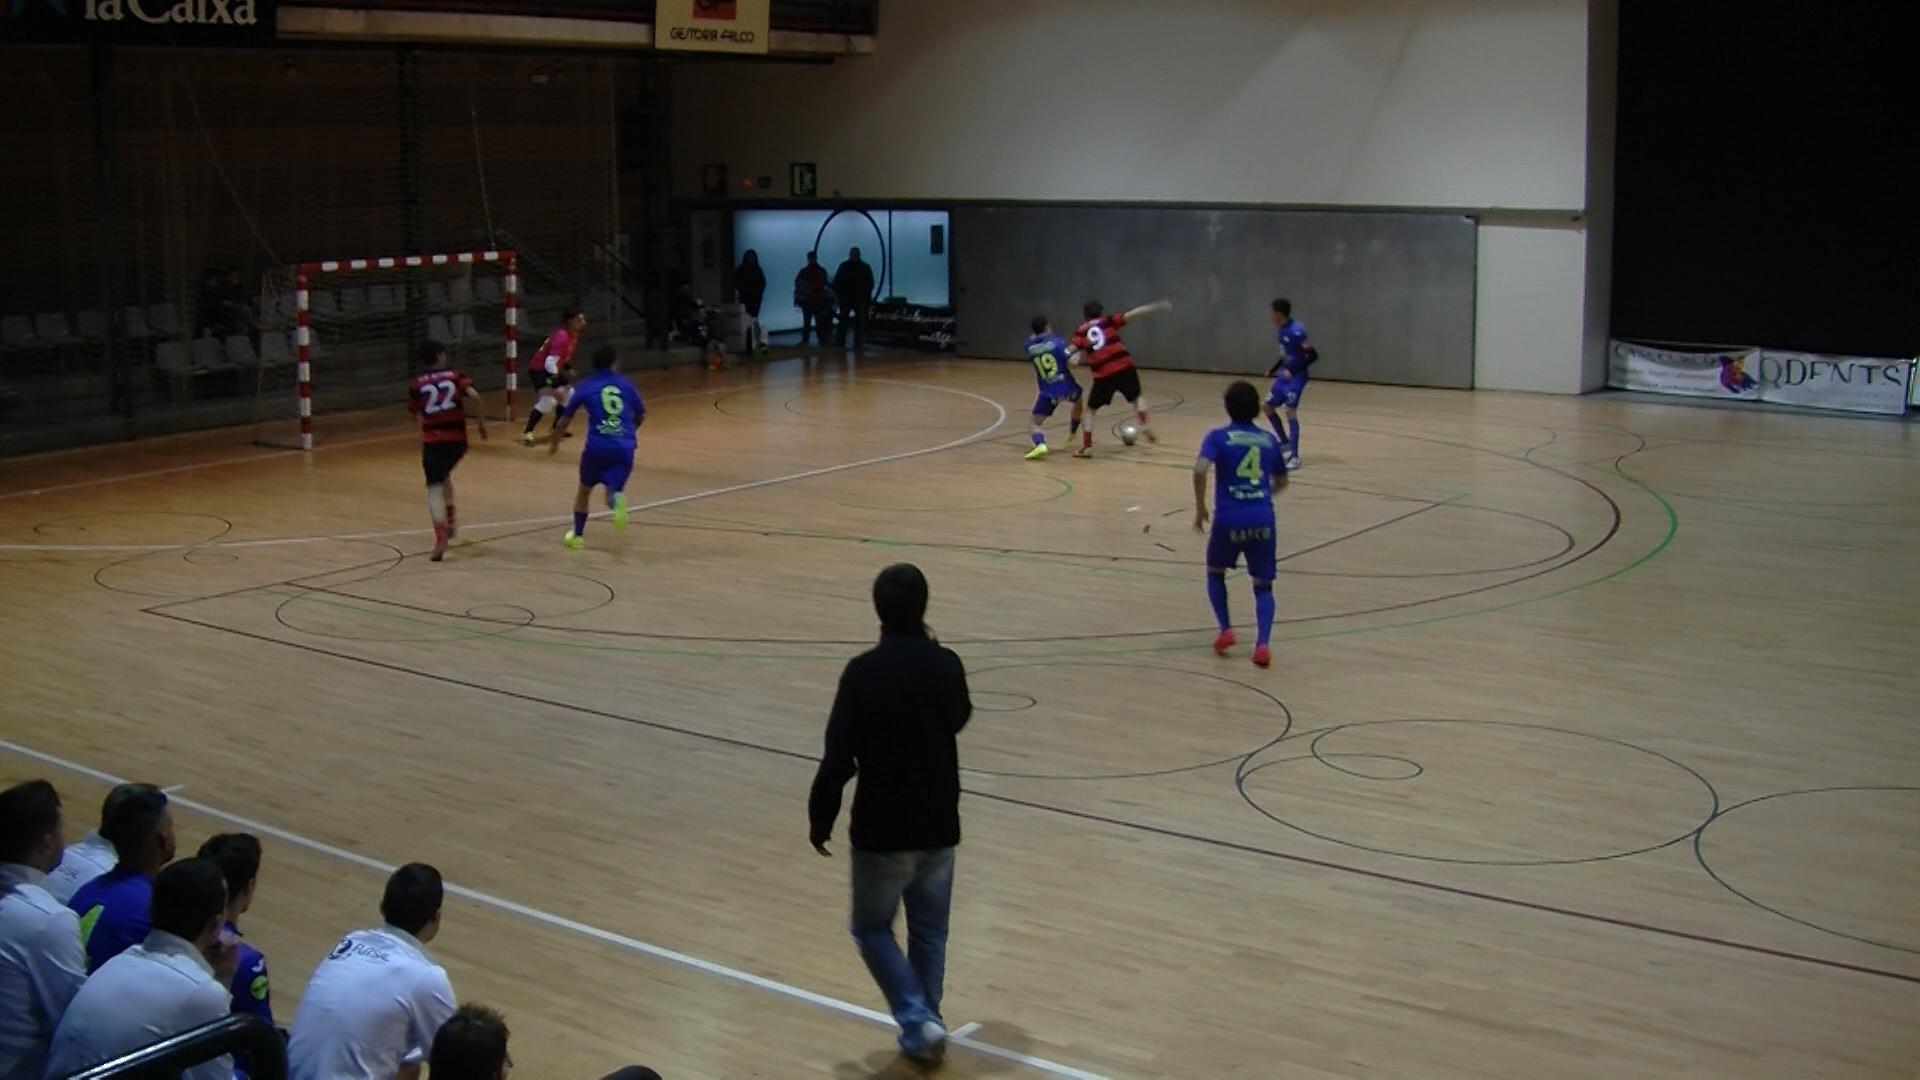 futbol-sala-solidari-00_00_57_01-imagen-fija004